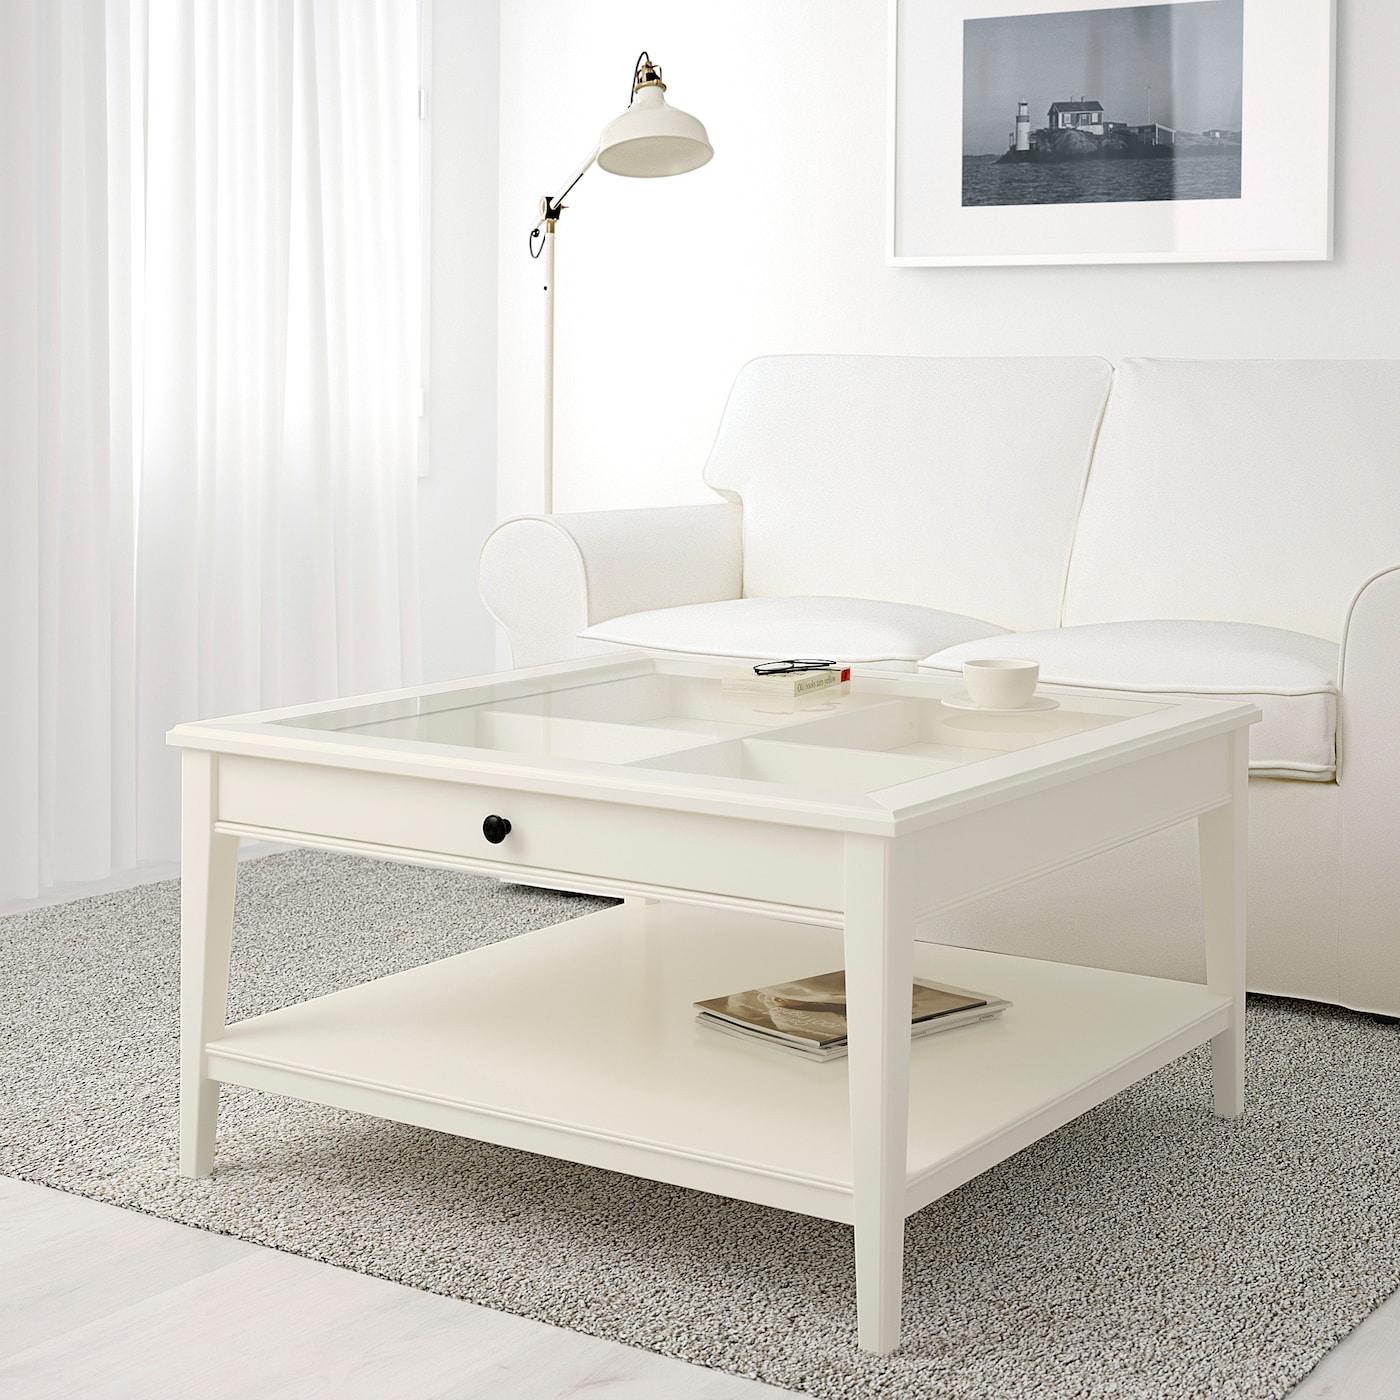 Liatorp Coffee Table White Glass 93x93 Cm Ikea [ 1400 x 1400 Pixel ]